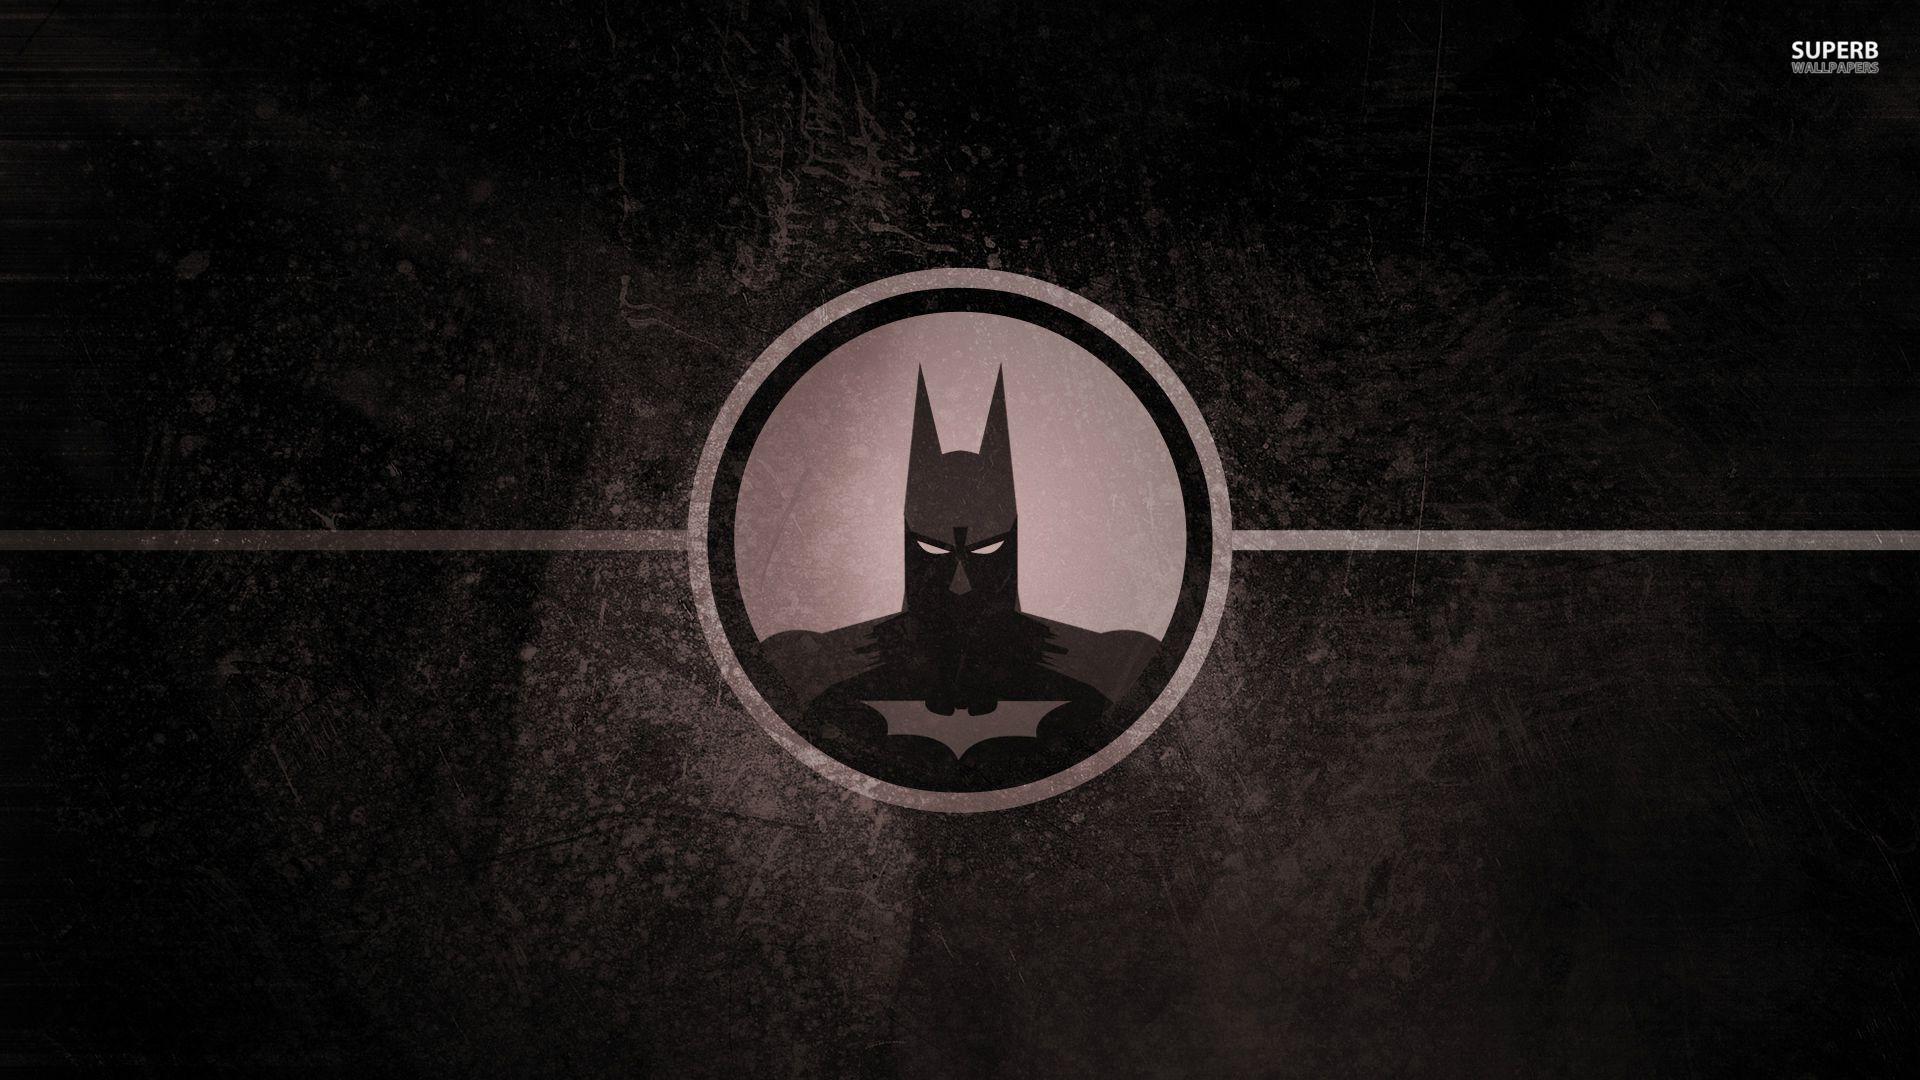 Batman cool wallpaper head logo windows mode - Cool logo wallpapers ...